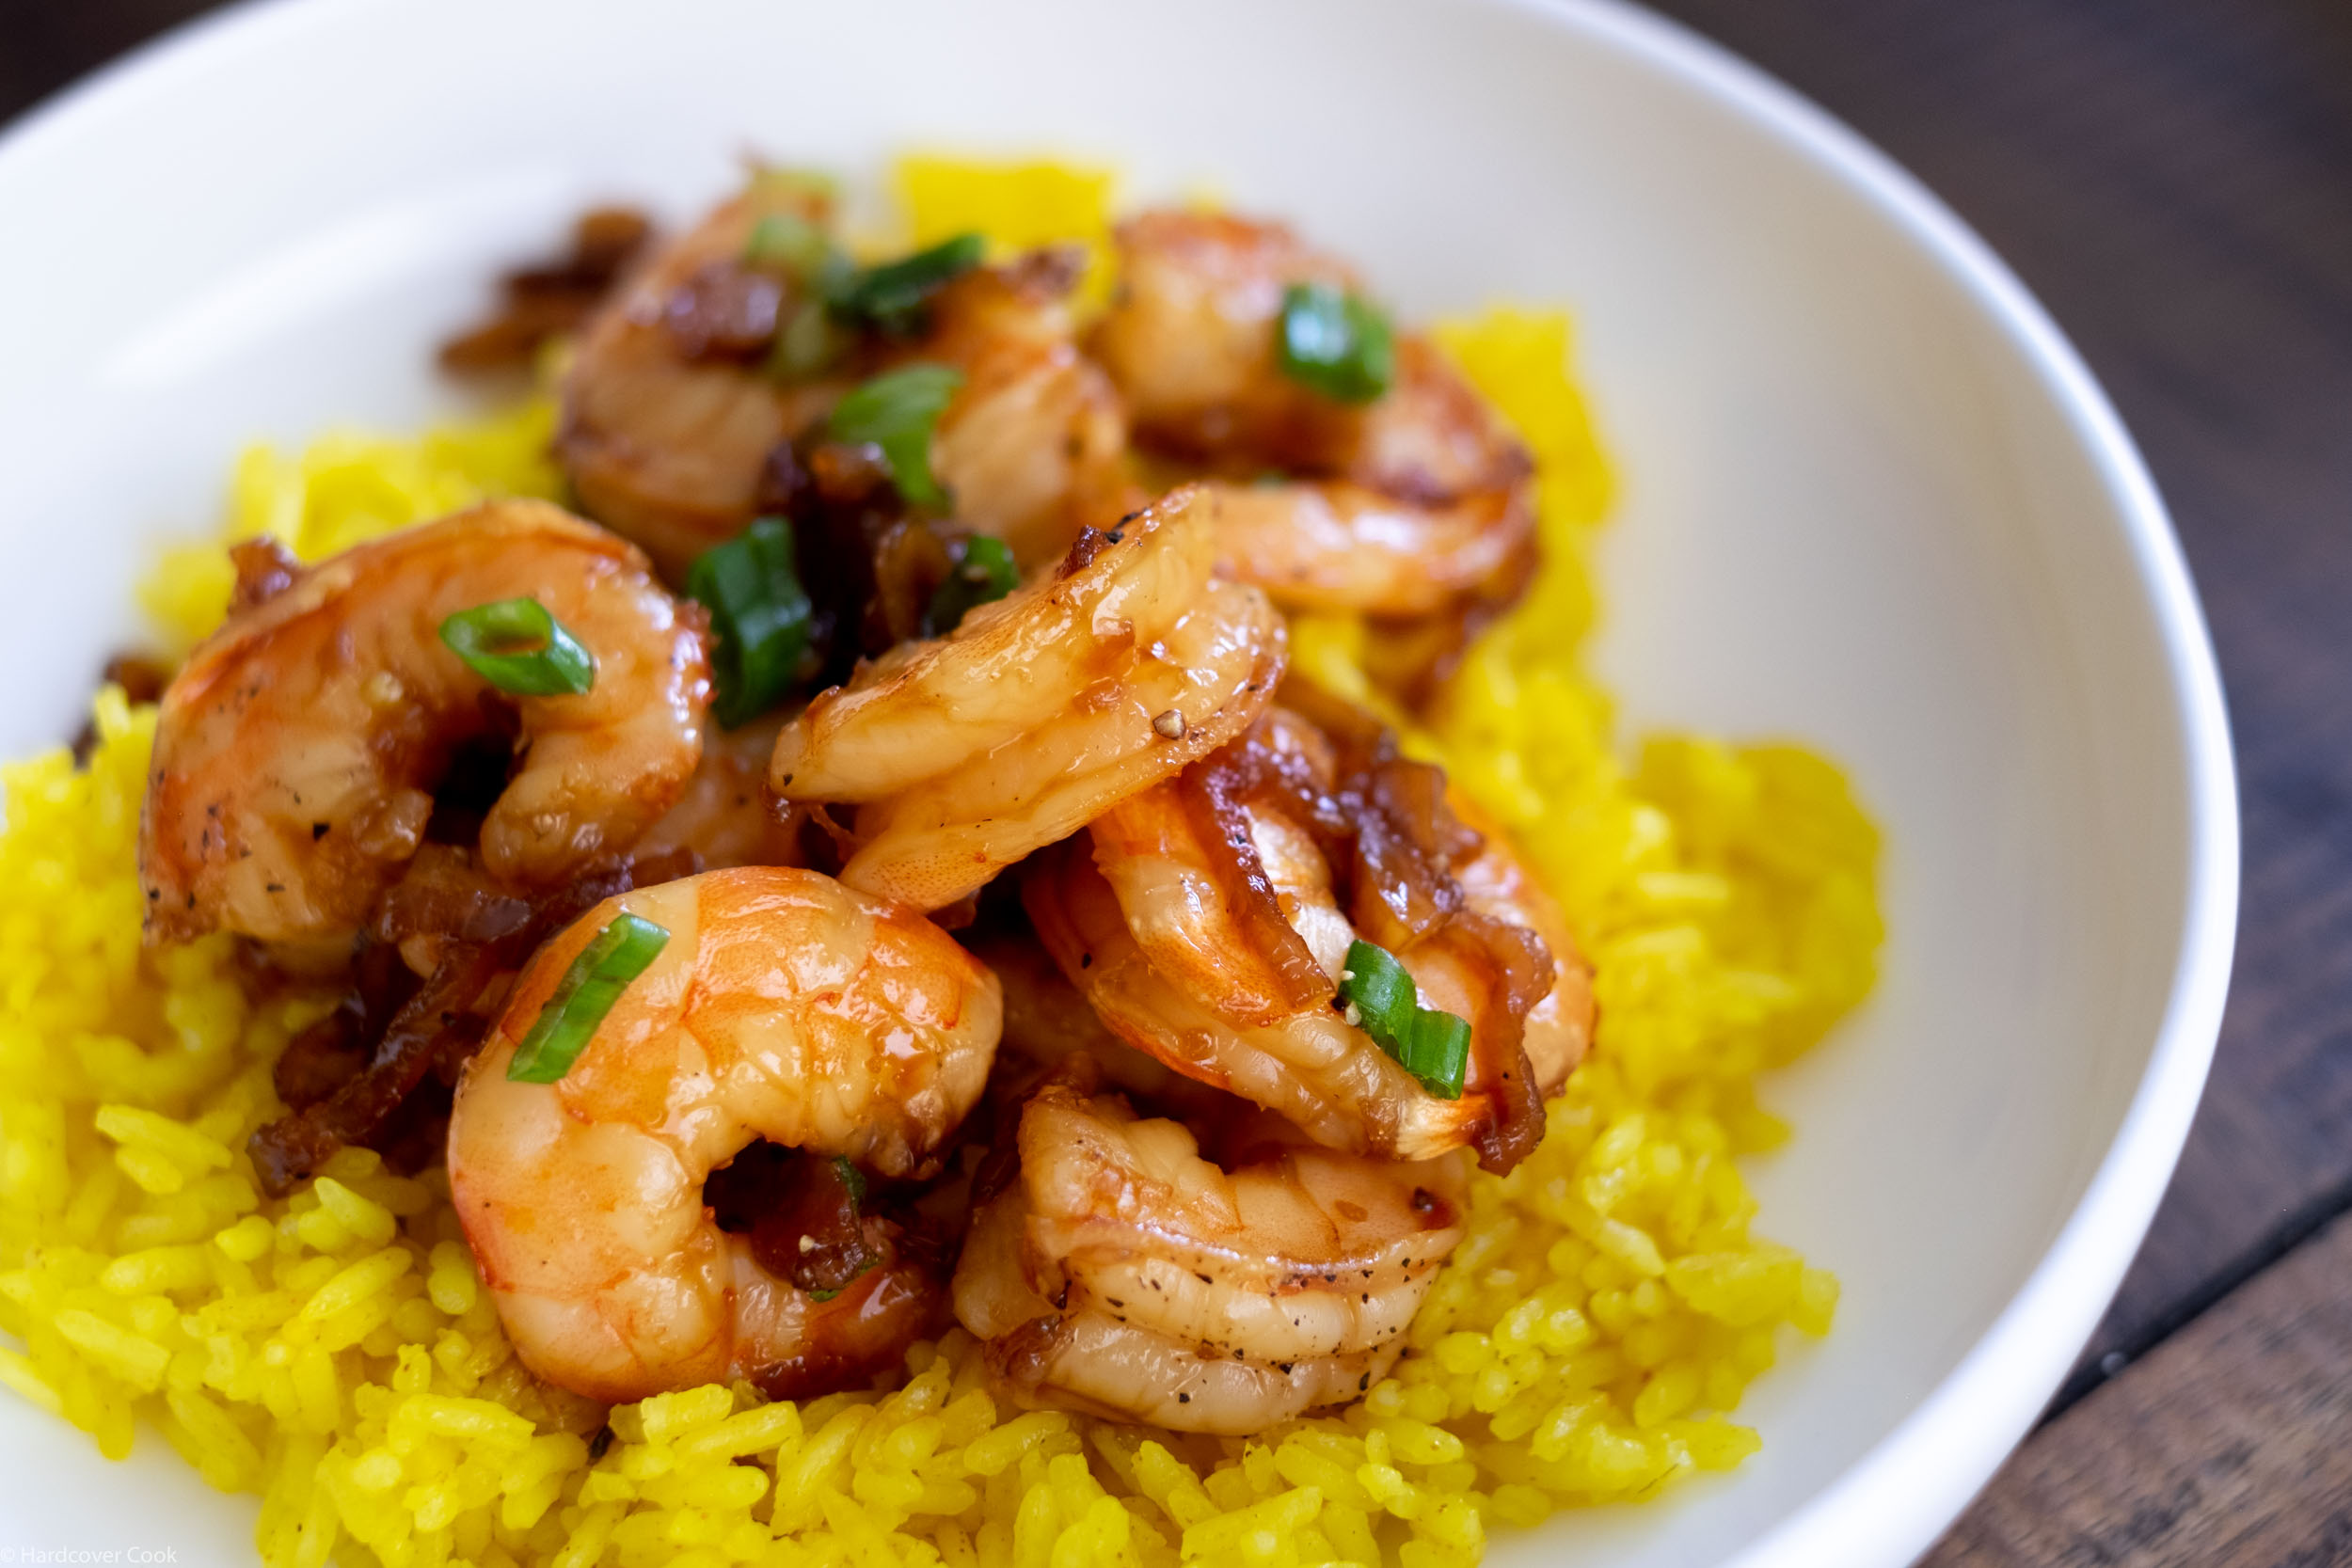 Shrimp in Coconut Caramel Sauce p. 107 served over Vibrant Turmeric Coconut Rice p. 188